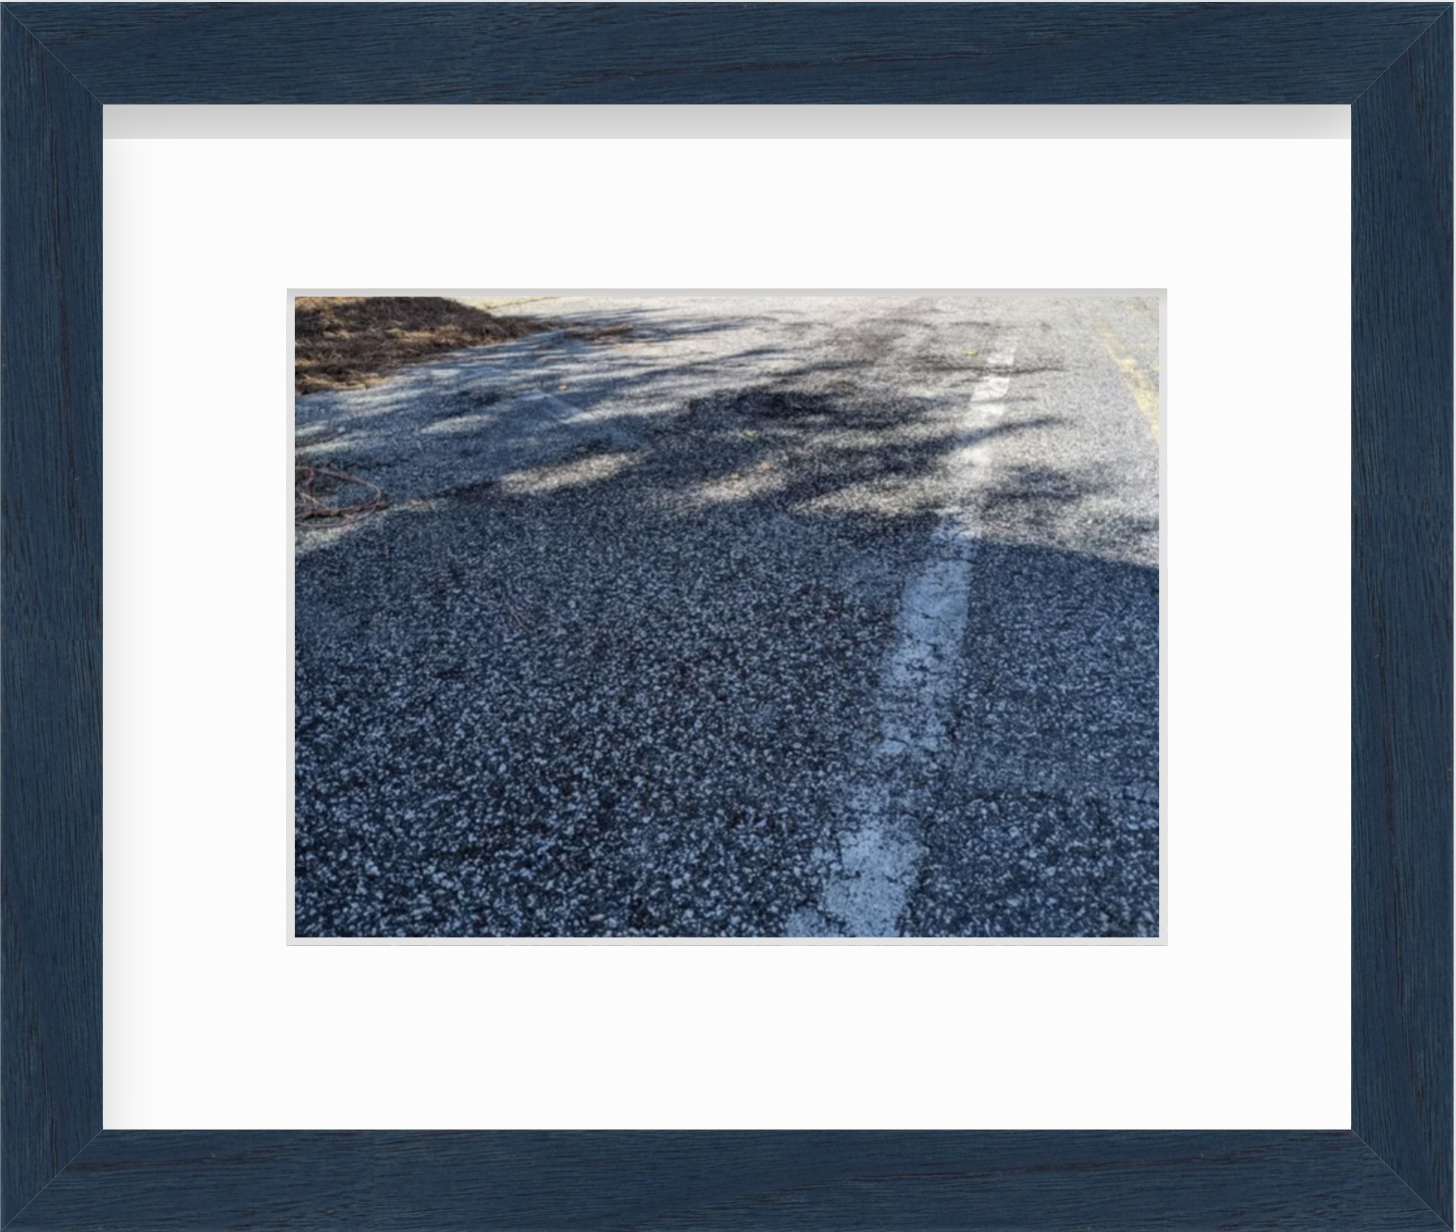 framed photo of road